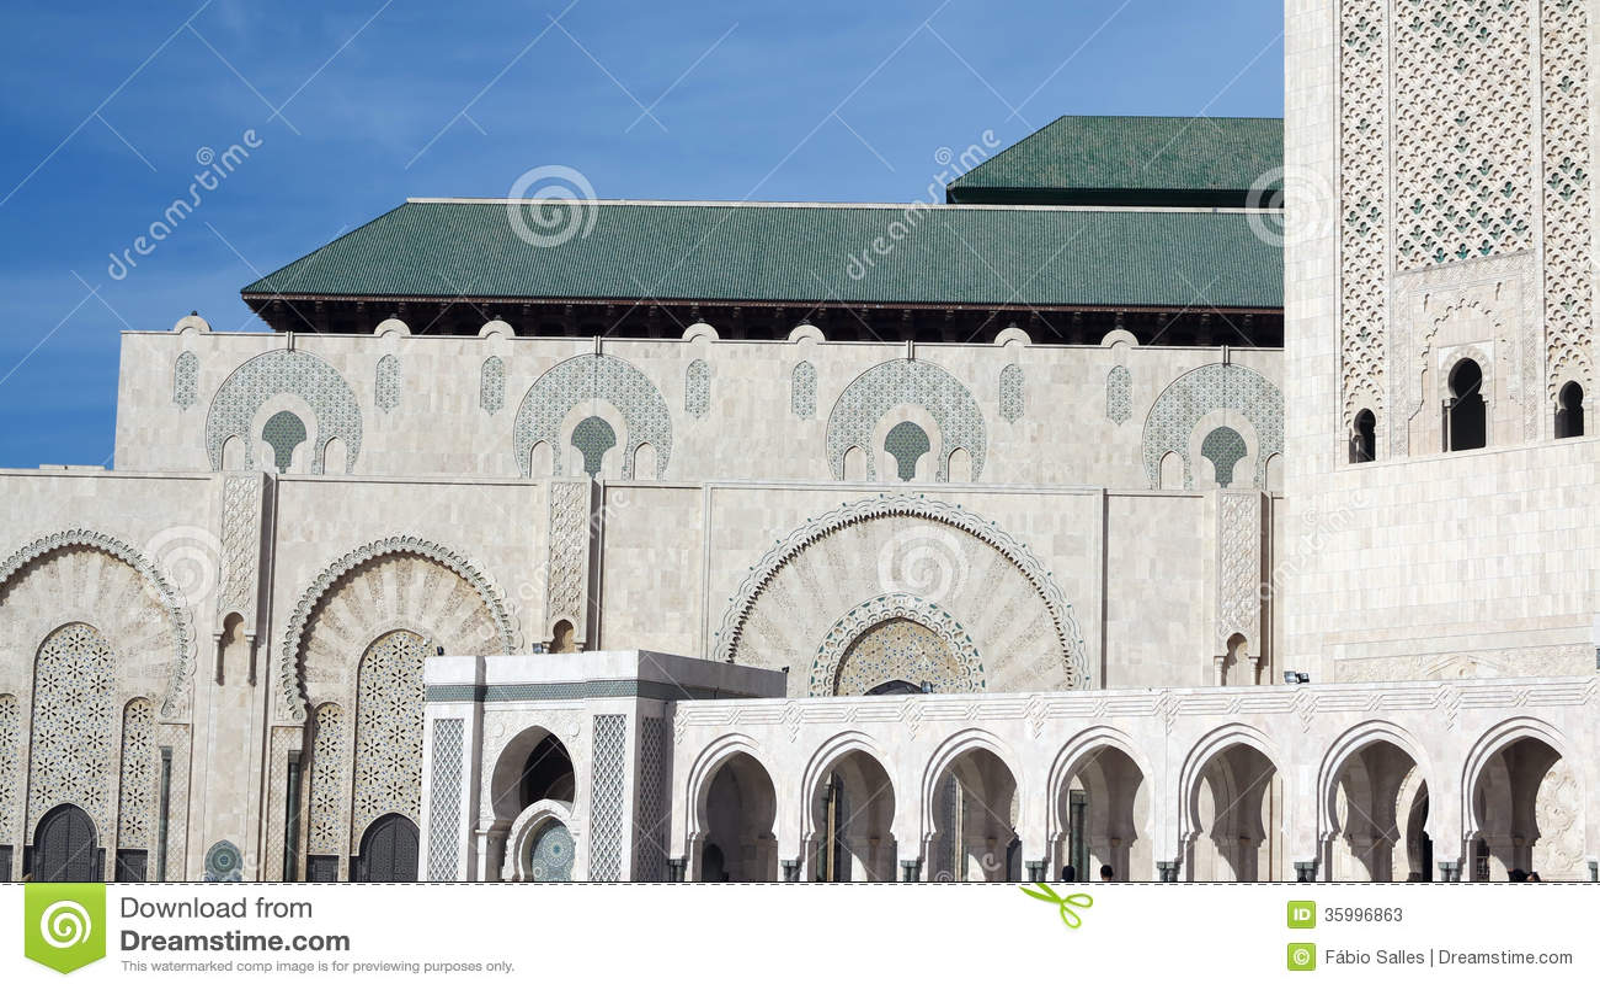 What Is A Mosque Detail: Casablanca Hassan II Mosque Minaret. Stock Image